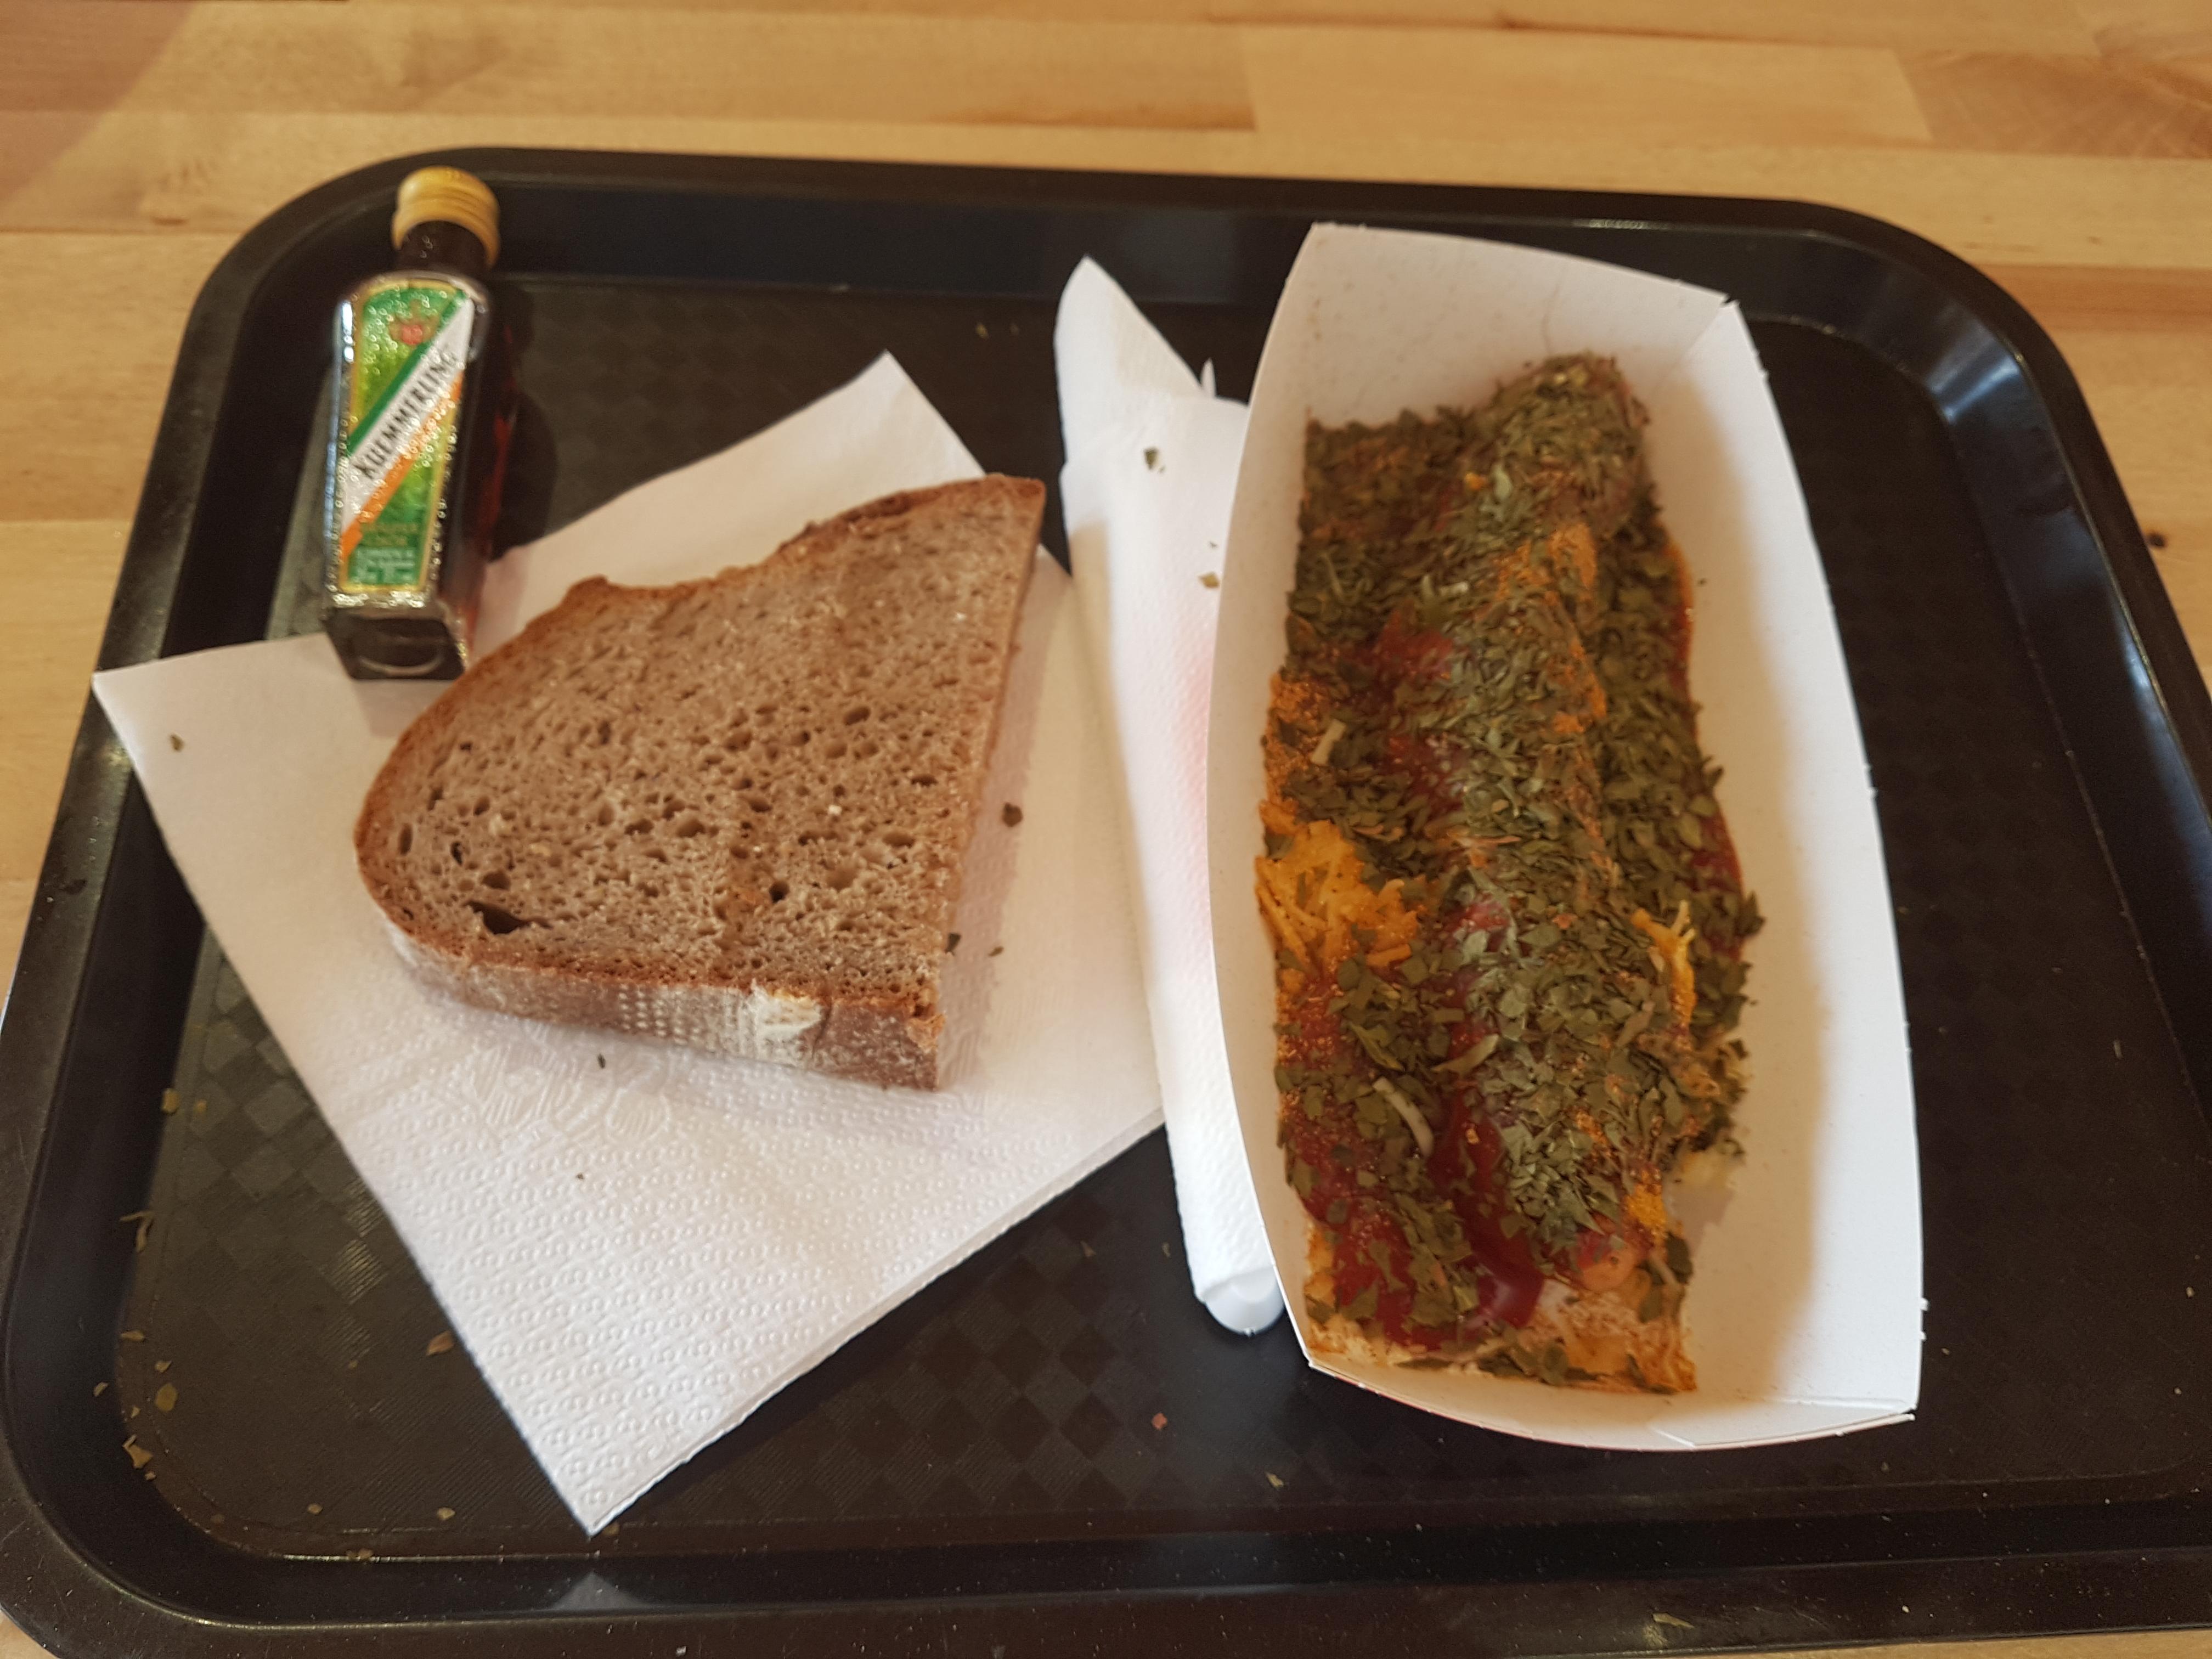 http://foodloader.net/Holz_2017-07-12_DJ_Duese_Wurst_2.jpg